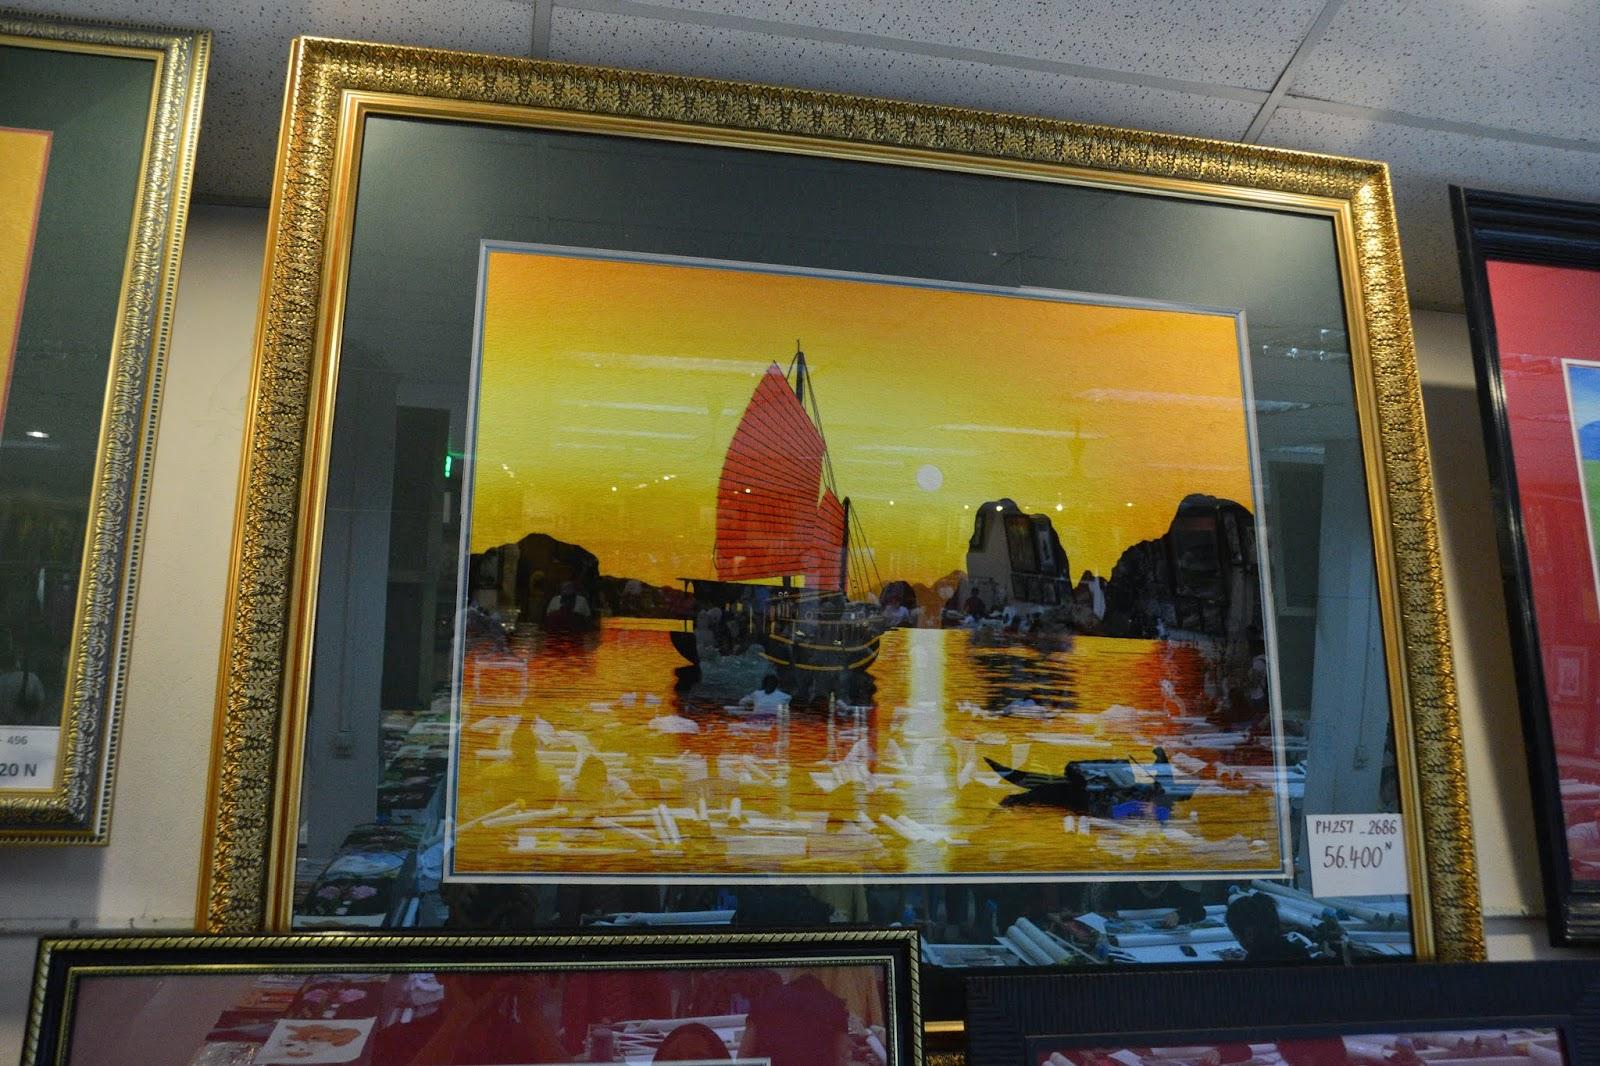 Vietnam - Saigon, Hanoi and Halong Bay | LMP Travel Blogs